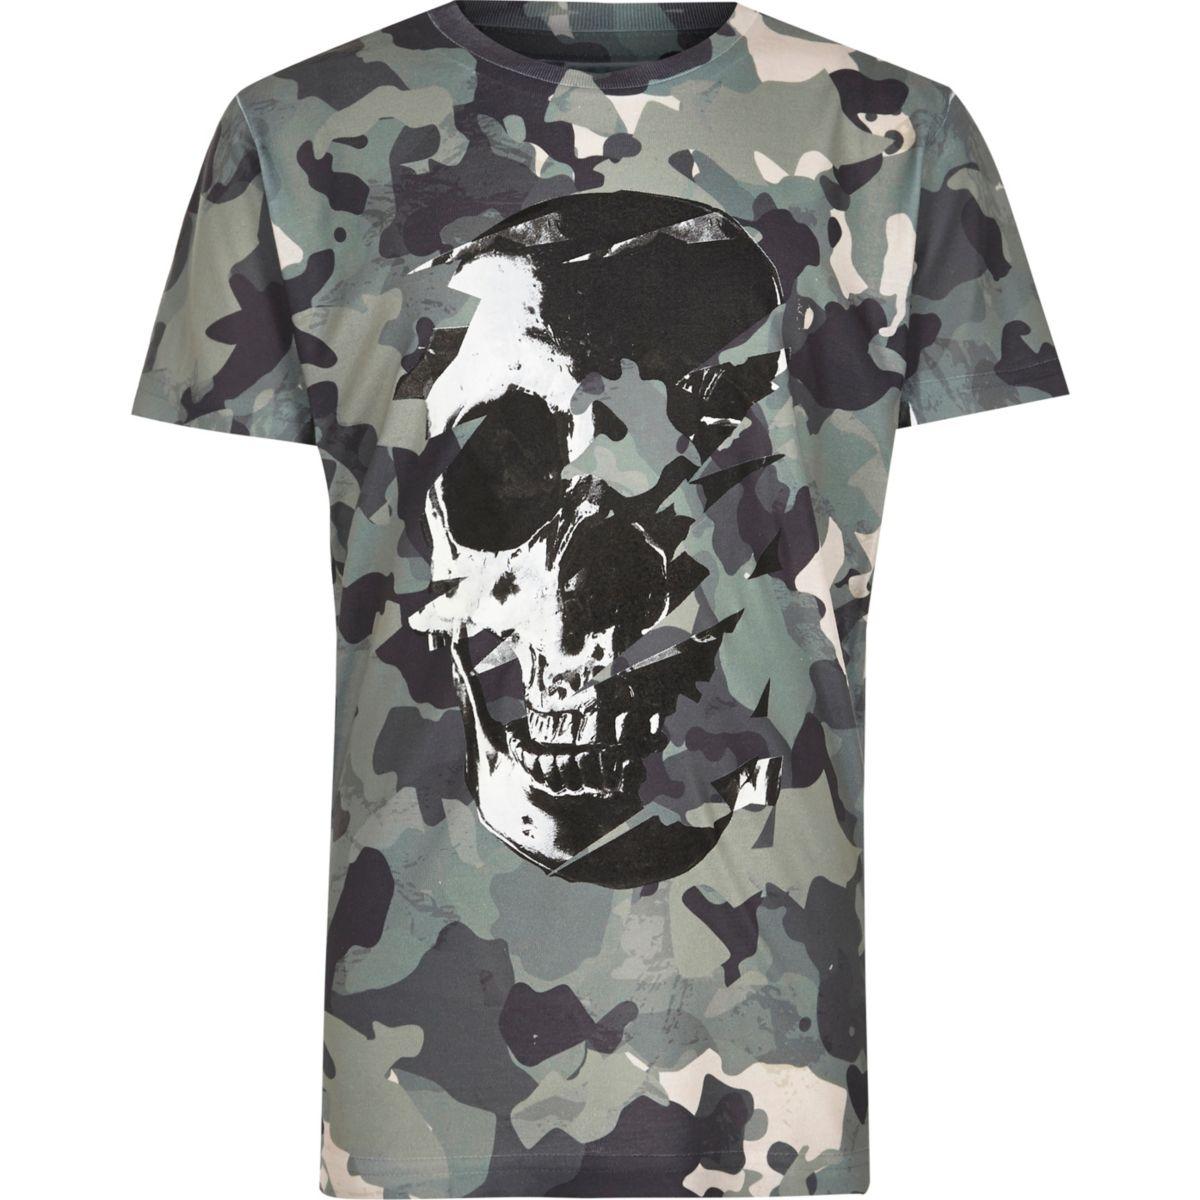 Boys green camo skull print t shirt tops sale boys for Camo print t shirt